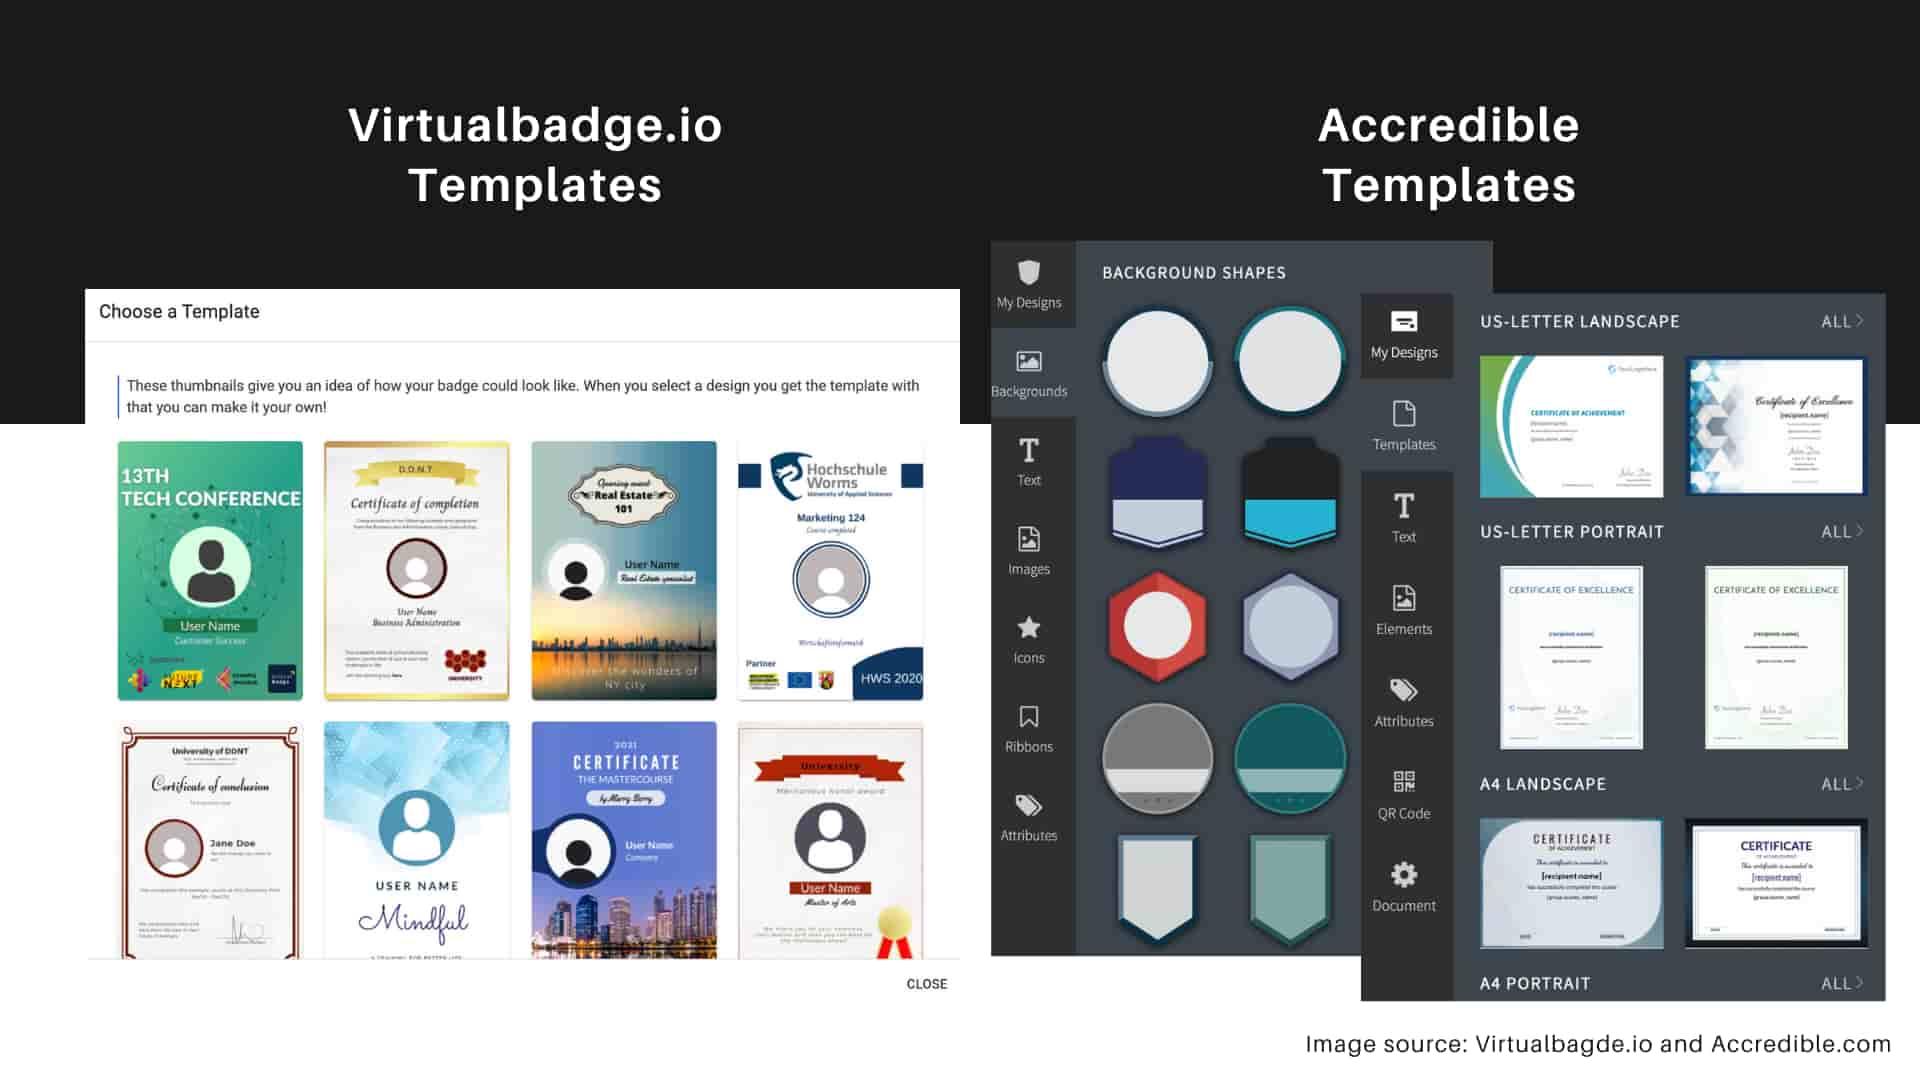 Virtualbadge.io vs Accredible - Templates options